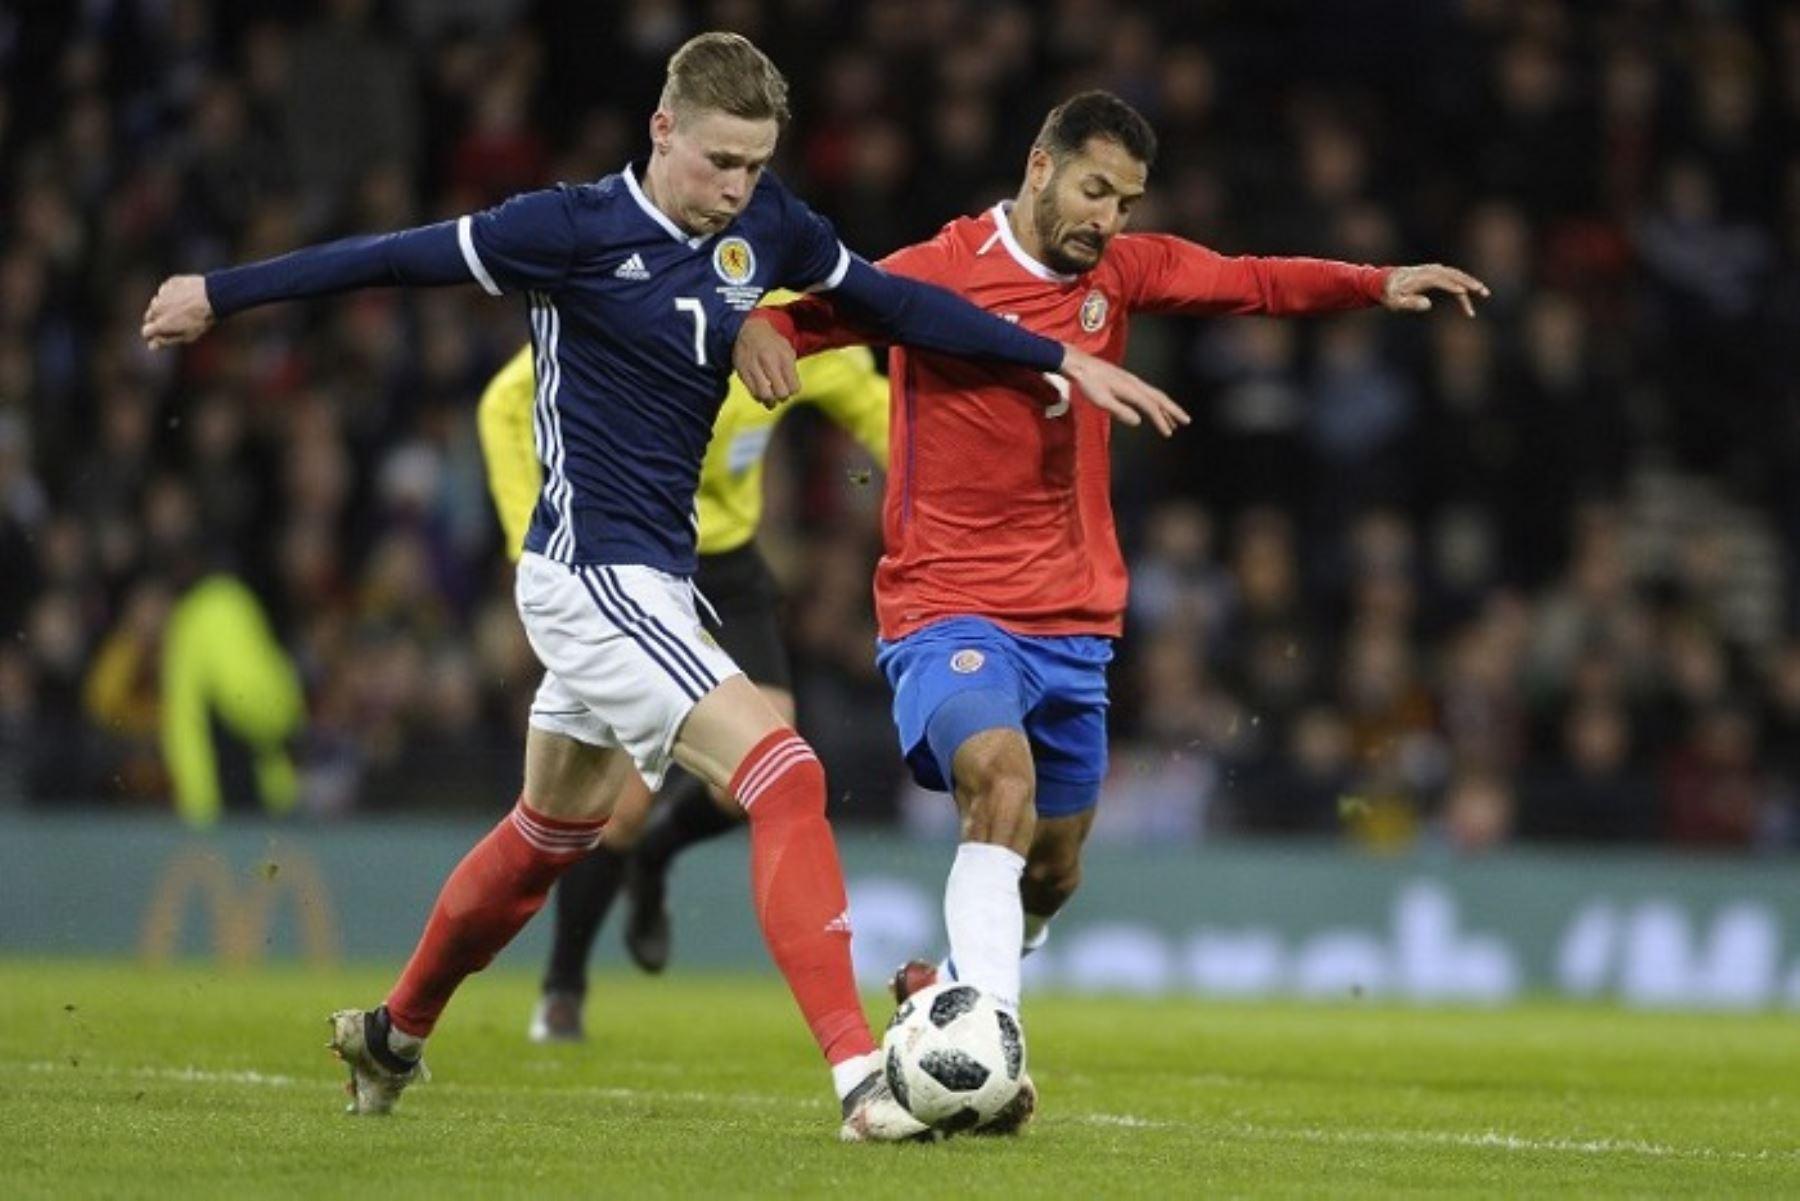 Escocia será un rival complicado para Perú.